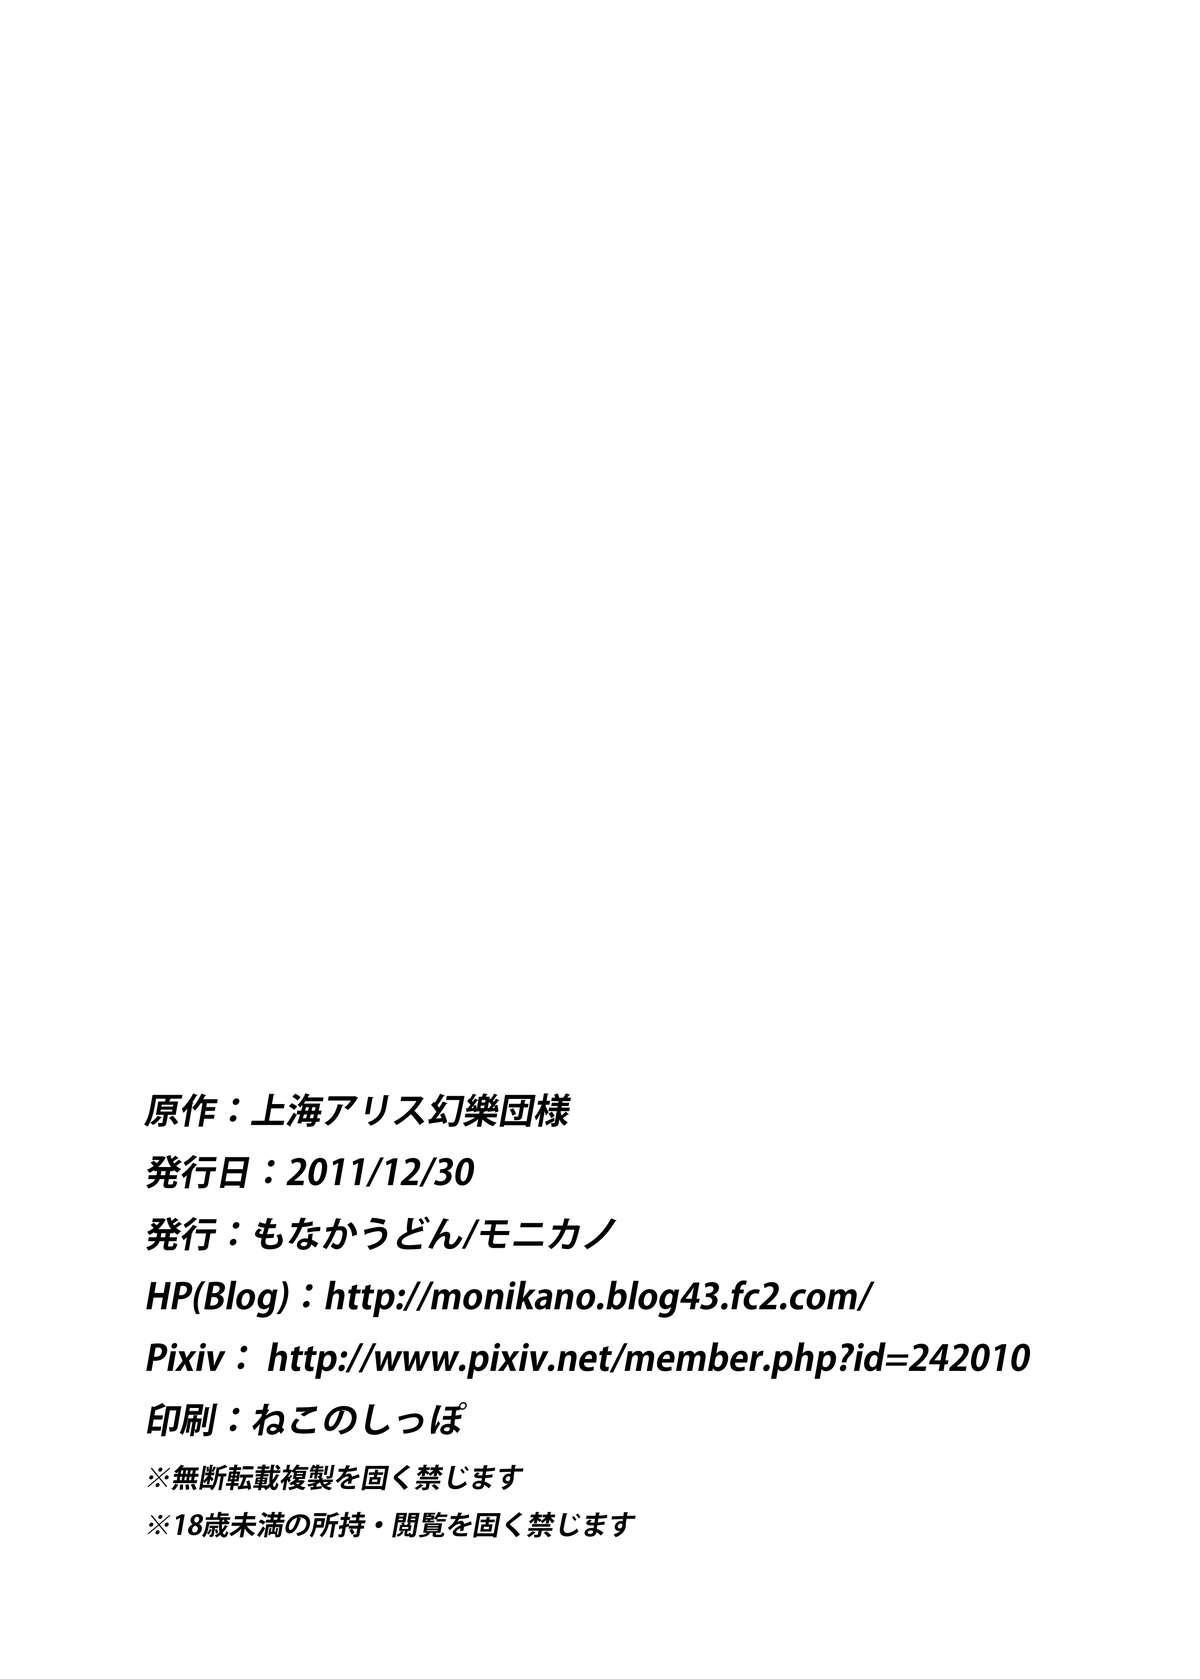 Kazami Yuuka Kyousei Zecchou Souchi 19